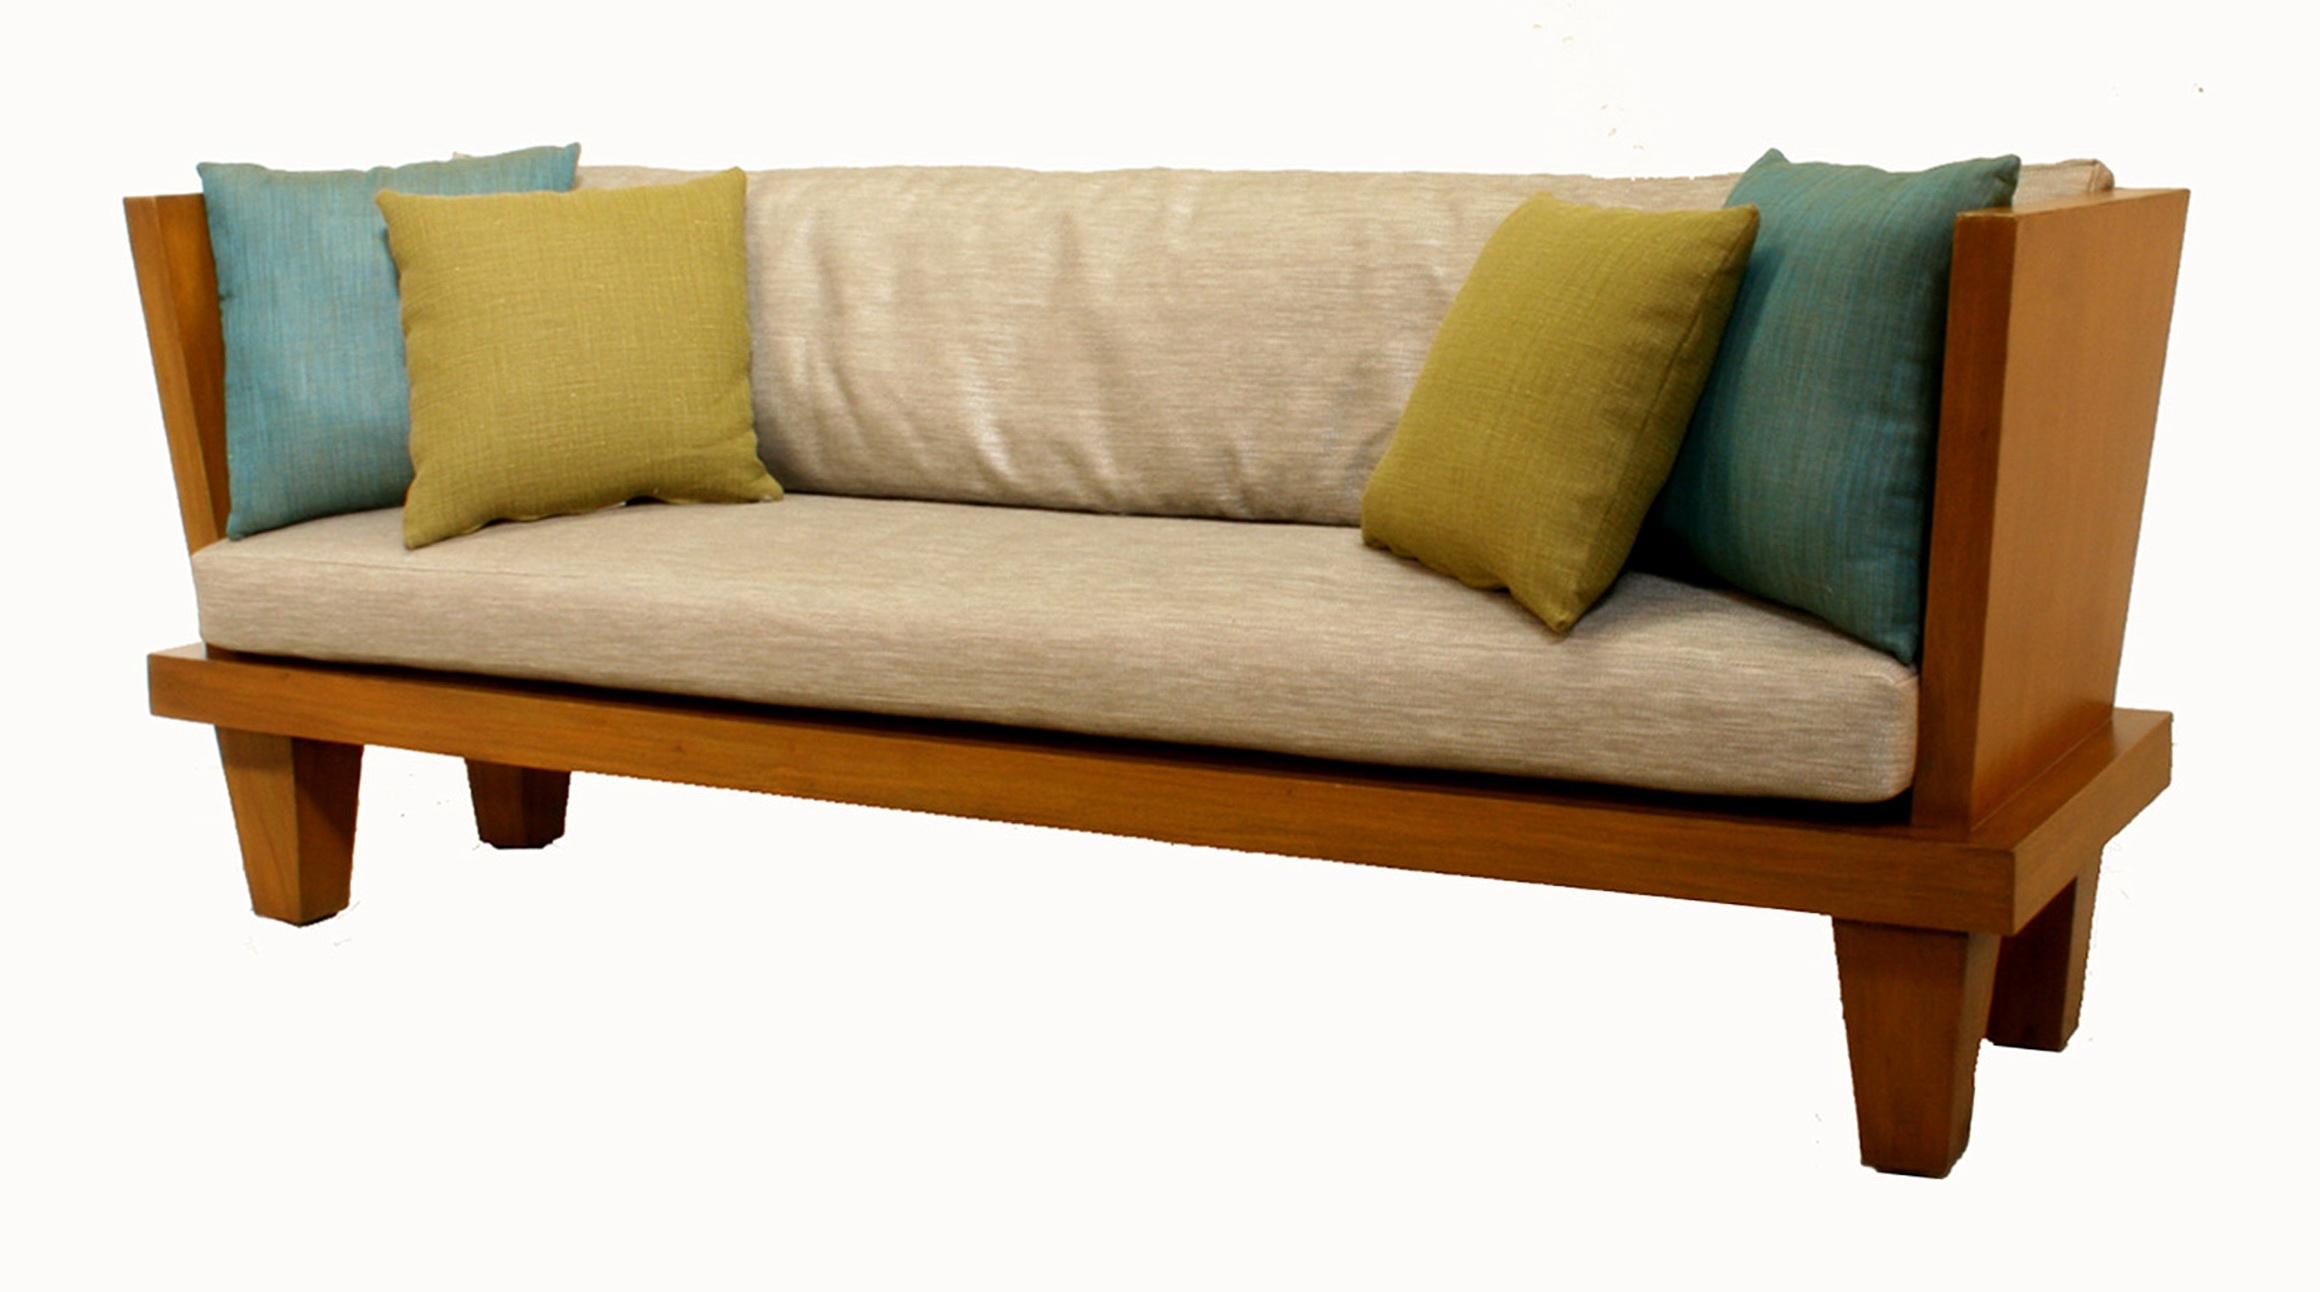 Indoor Bench Cushion 40 X 16 Home Design Ideas